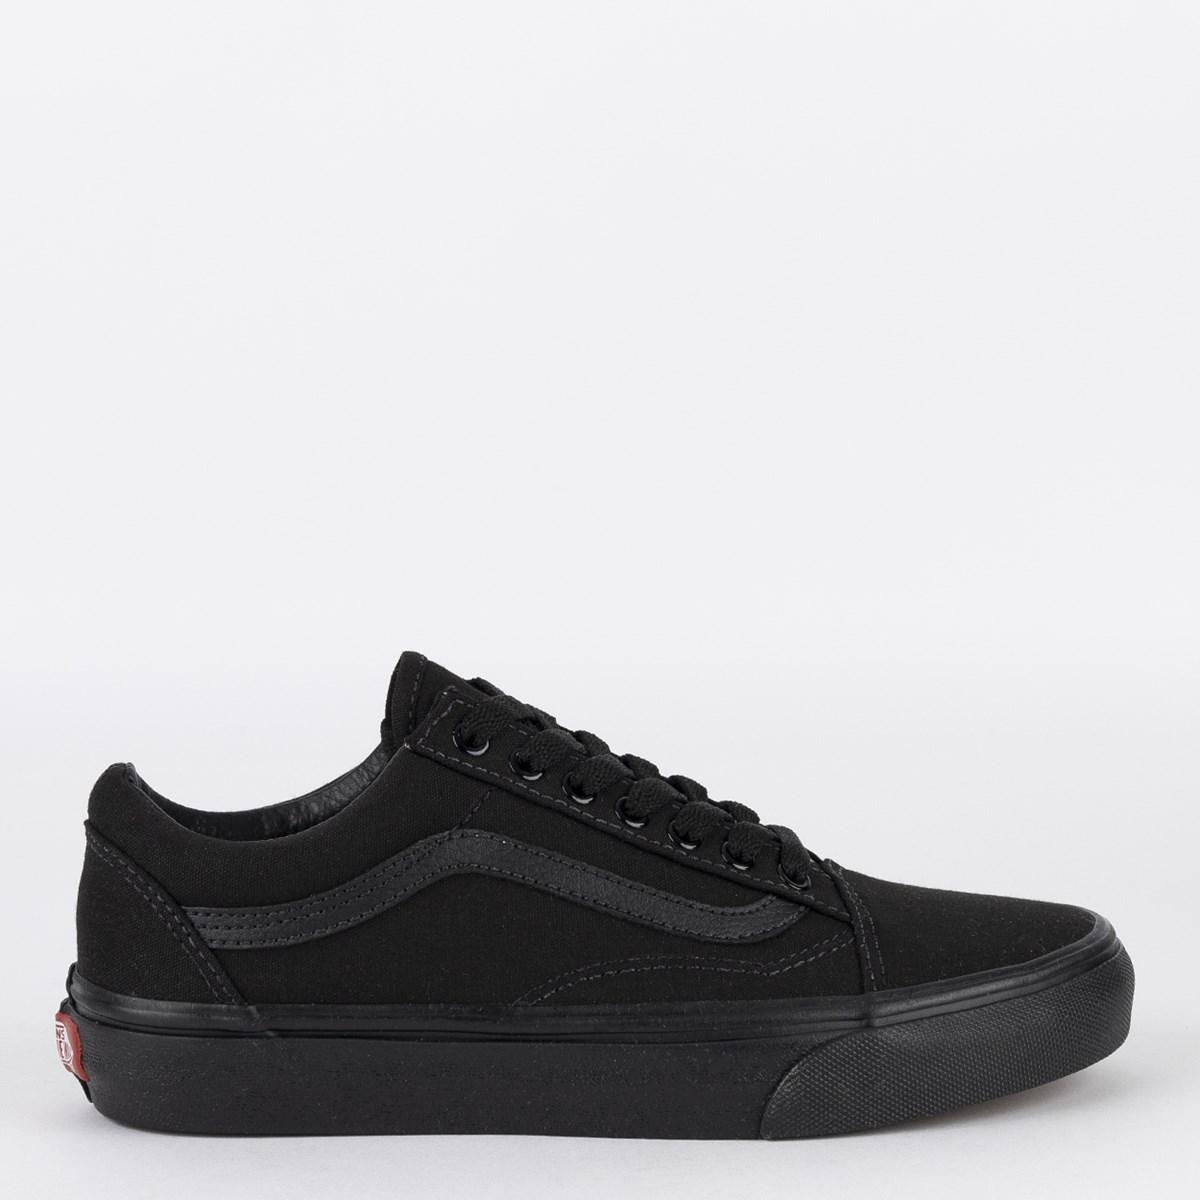 Tênis Vans Old Skool Black Black VN - 0D3HBKA